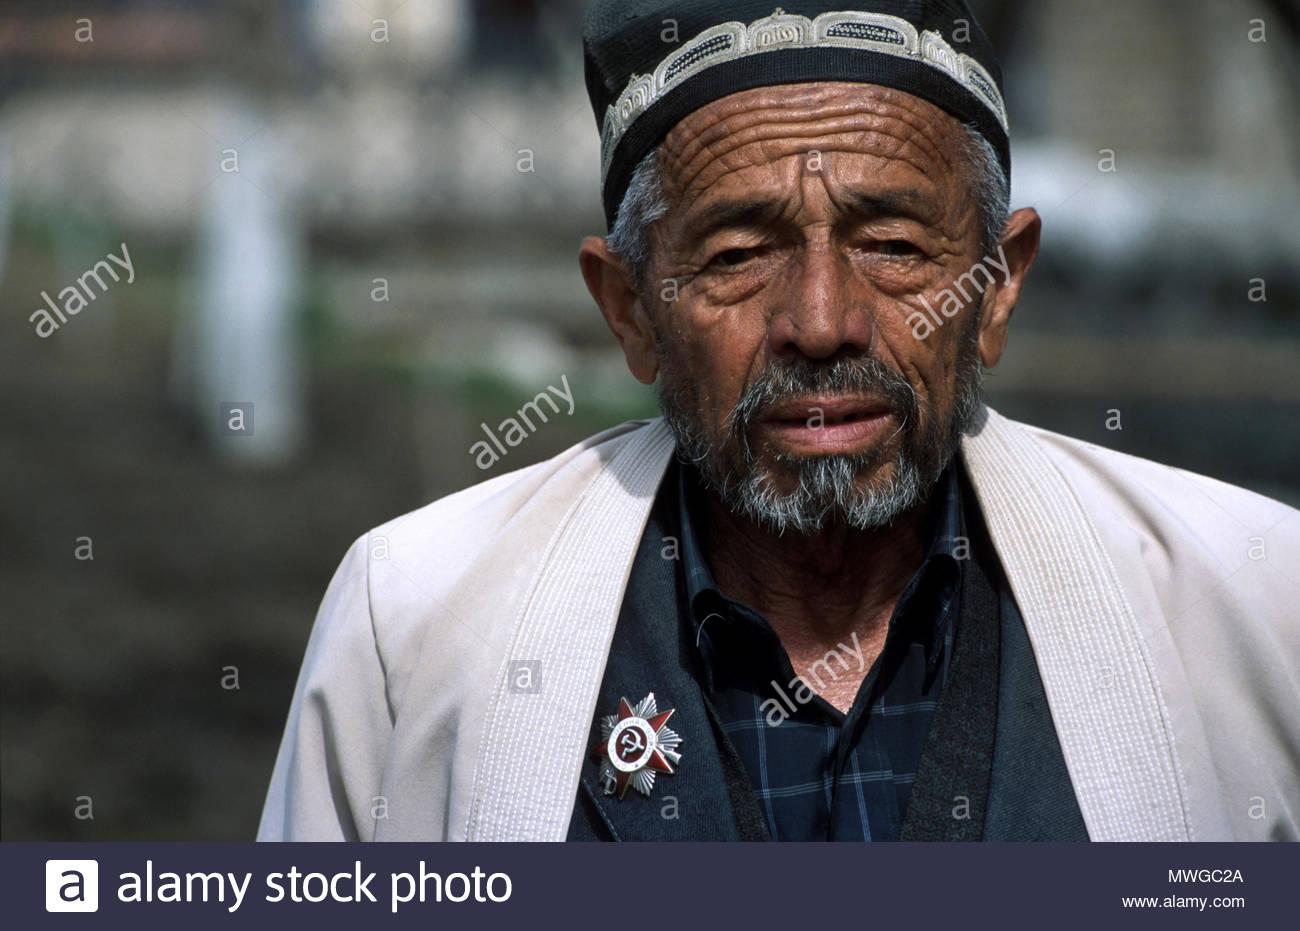 Uzbekistan, Samarkand. Portrait of an old man. Stock Photo